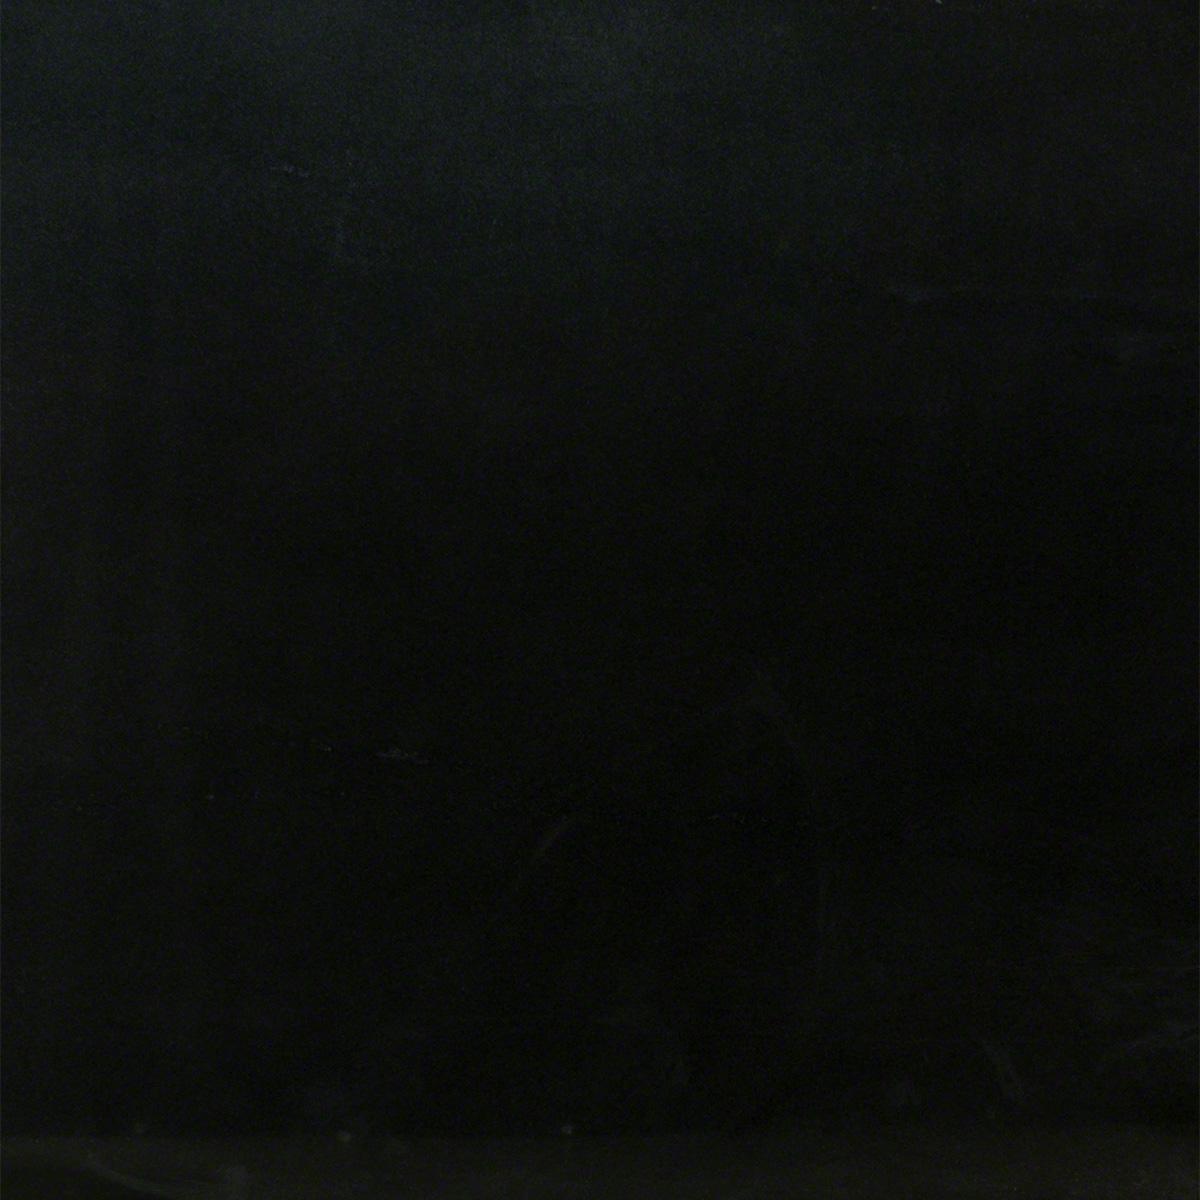 2Cm Absolute Black Premium Polished Slab